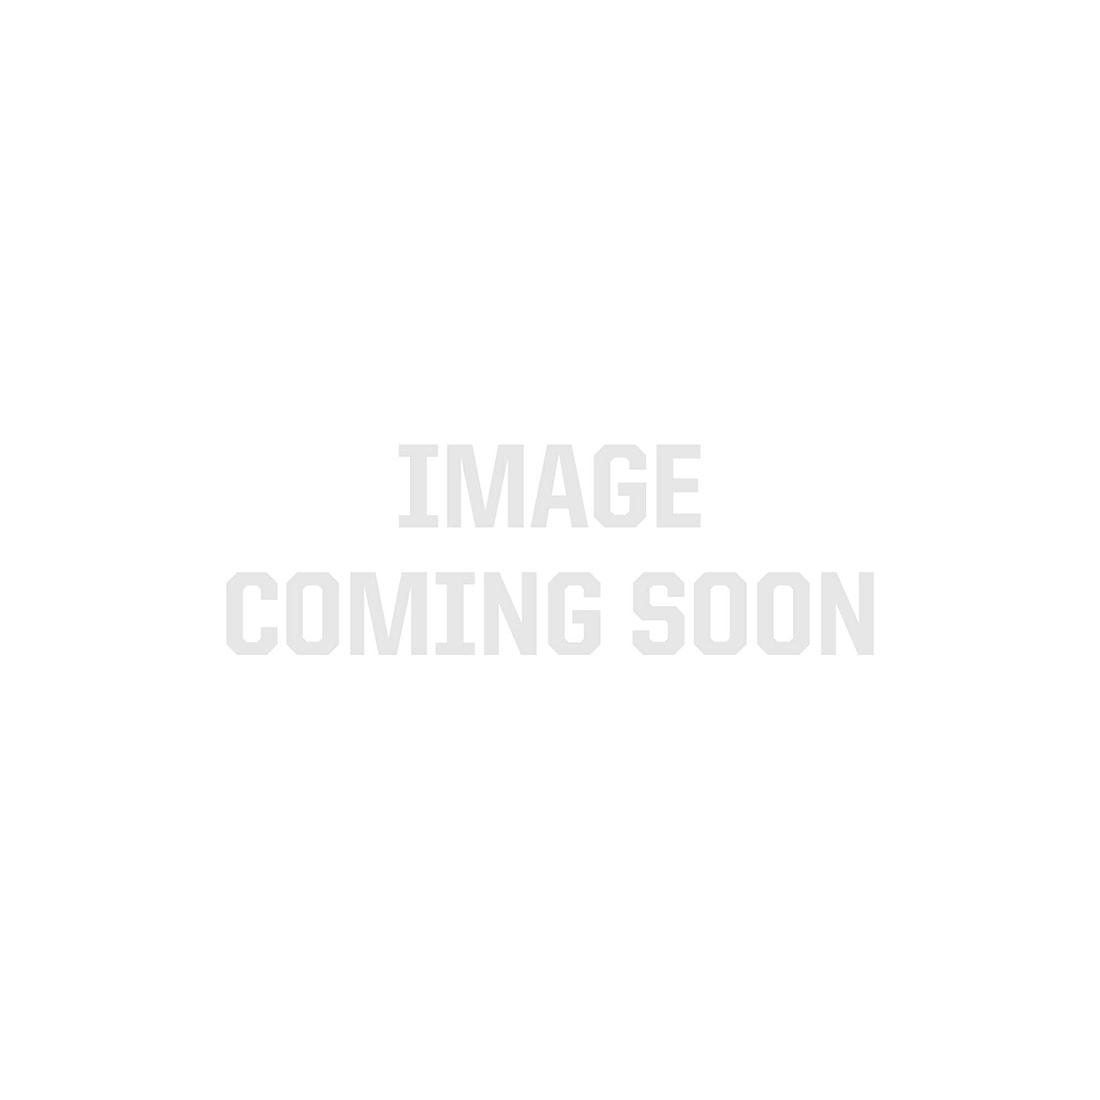 Madrix Key ultimate V3.x (256 DMX universes, 1,310,720 DVI pixels)